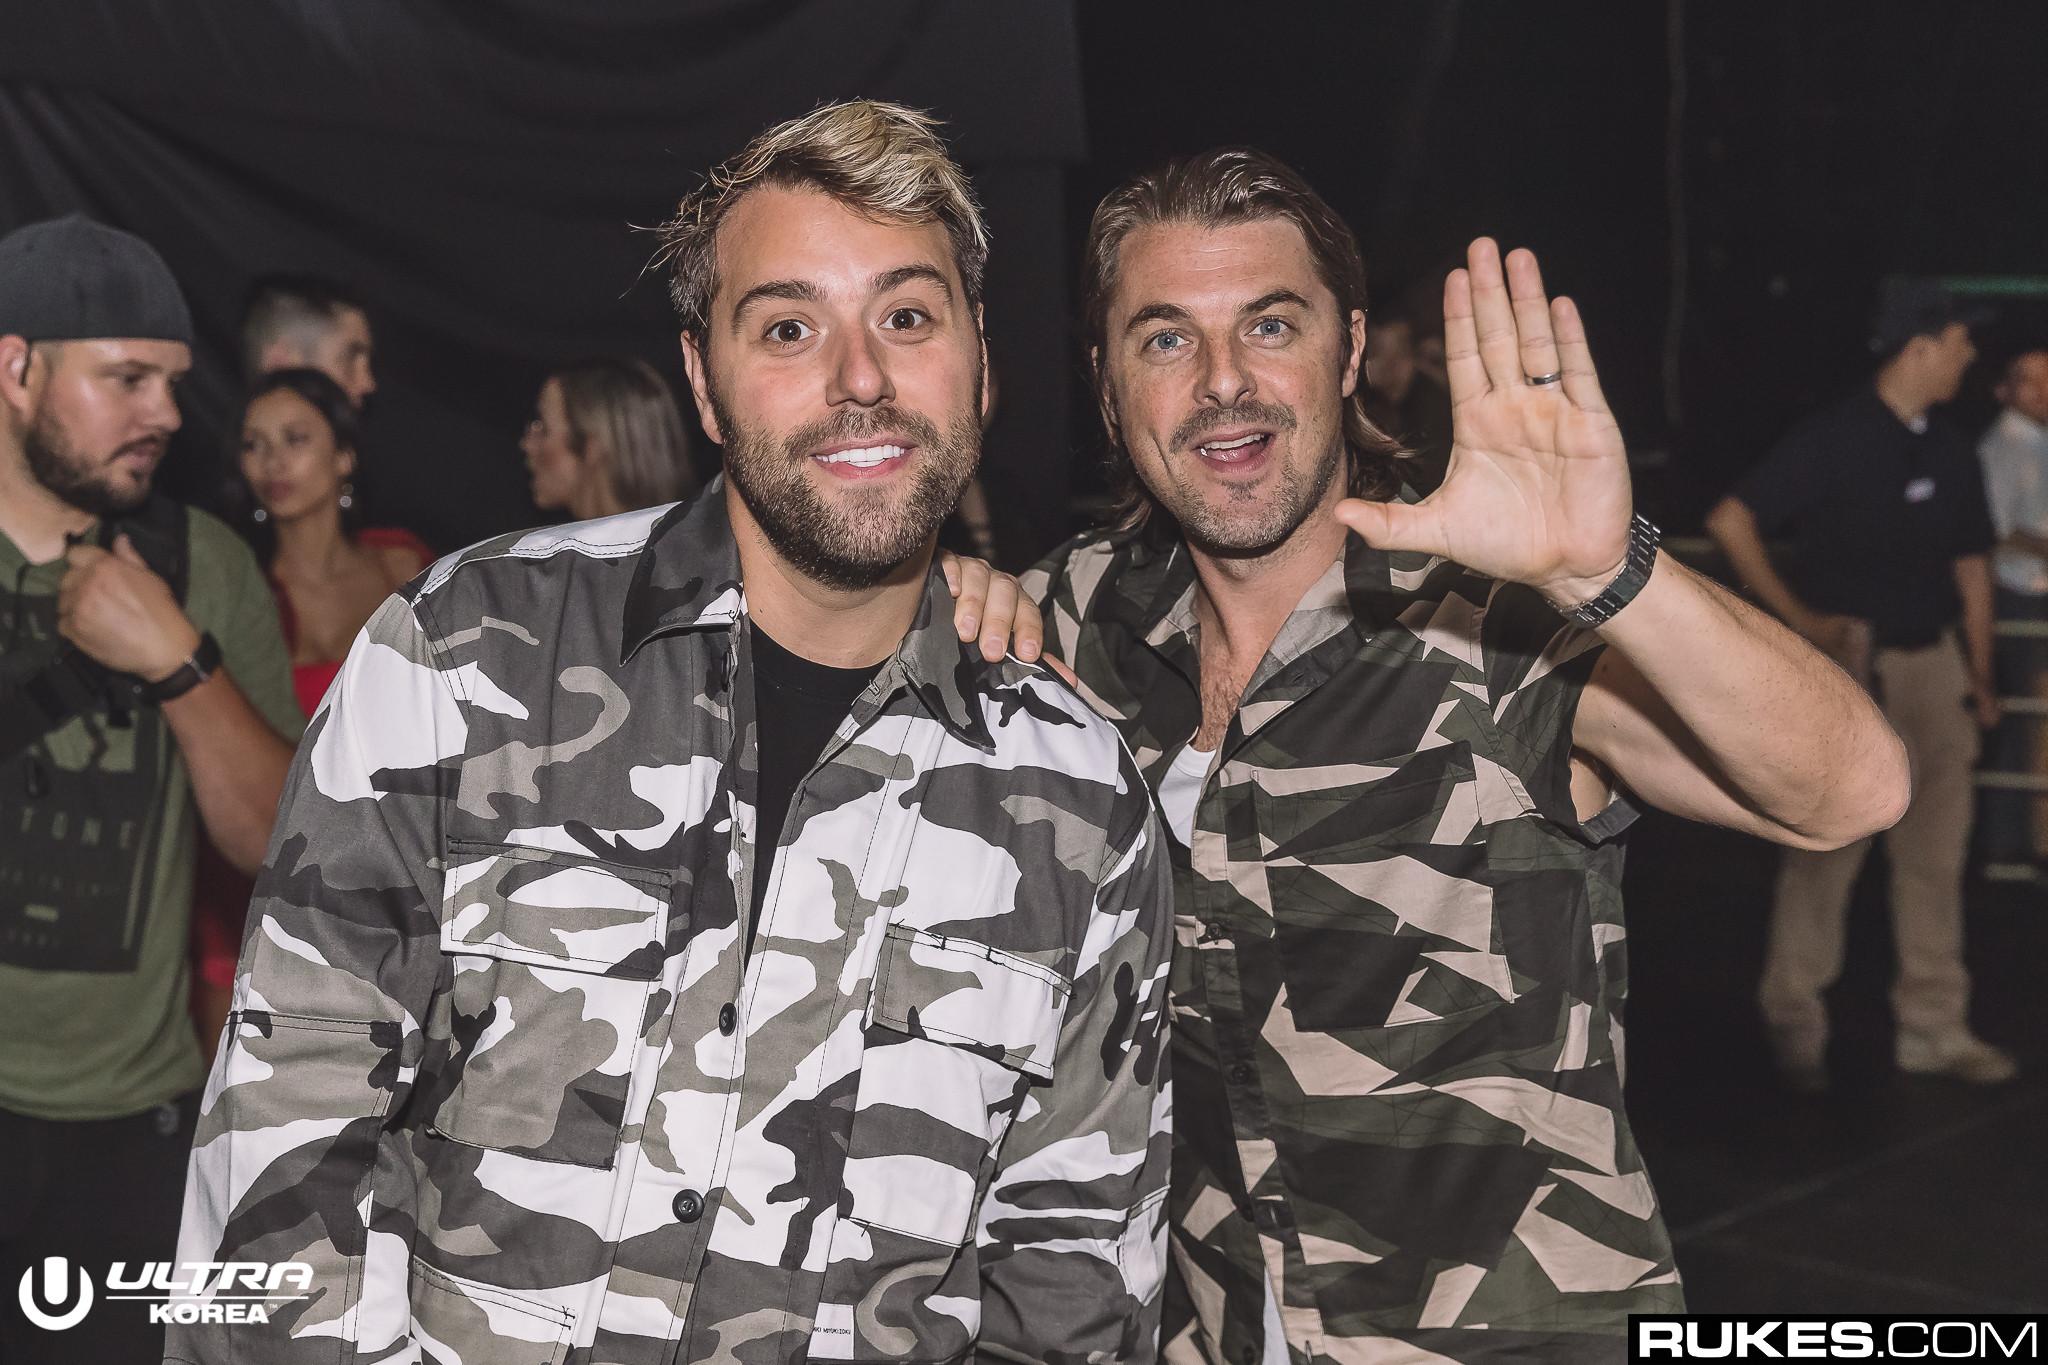 Axwell Λ Ingrossoプロジェクトが終了!?Swedish House Mafiaの再始動についてSebastian Ingrossoが語る!